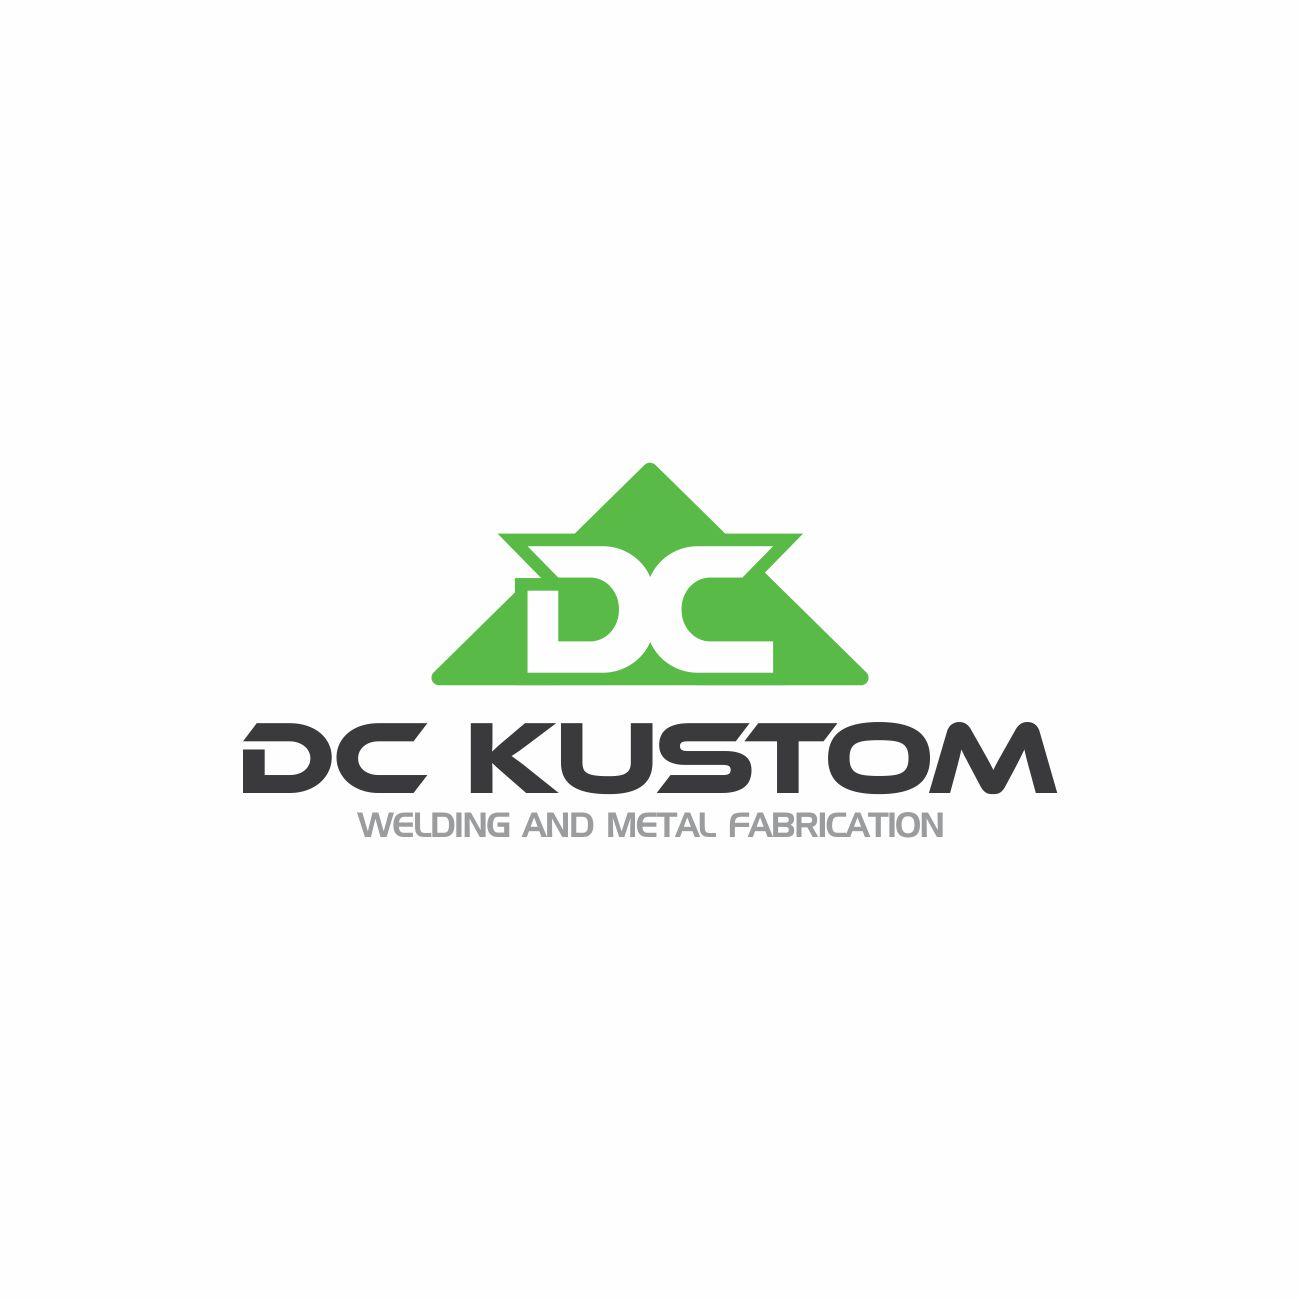 Logo Design by RasYa Muhammad Athaya - Entry No. 168 in the Logo Design Contest Imaginative Logo Design for DC KUSTOM WELDING & METAL FABRICATION.